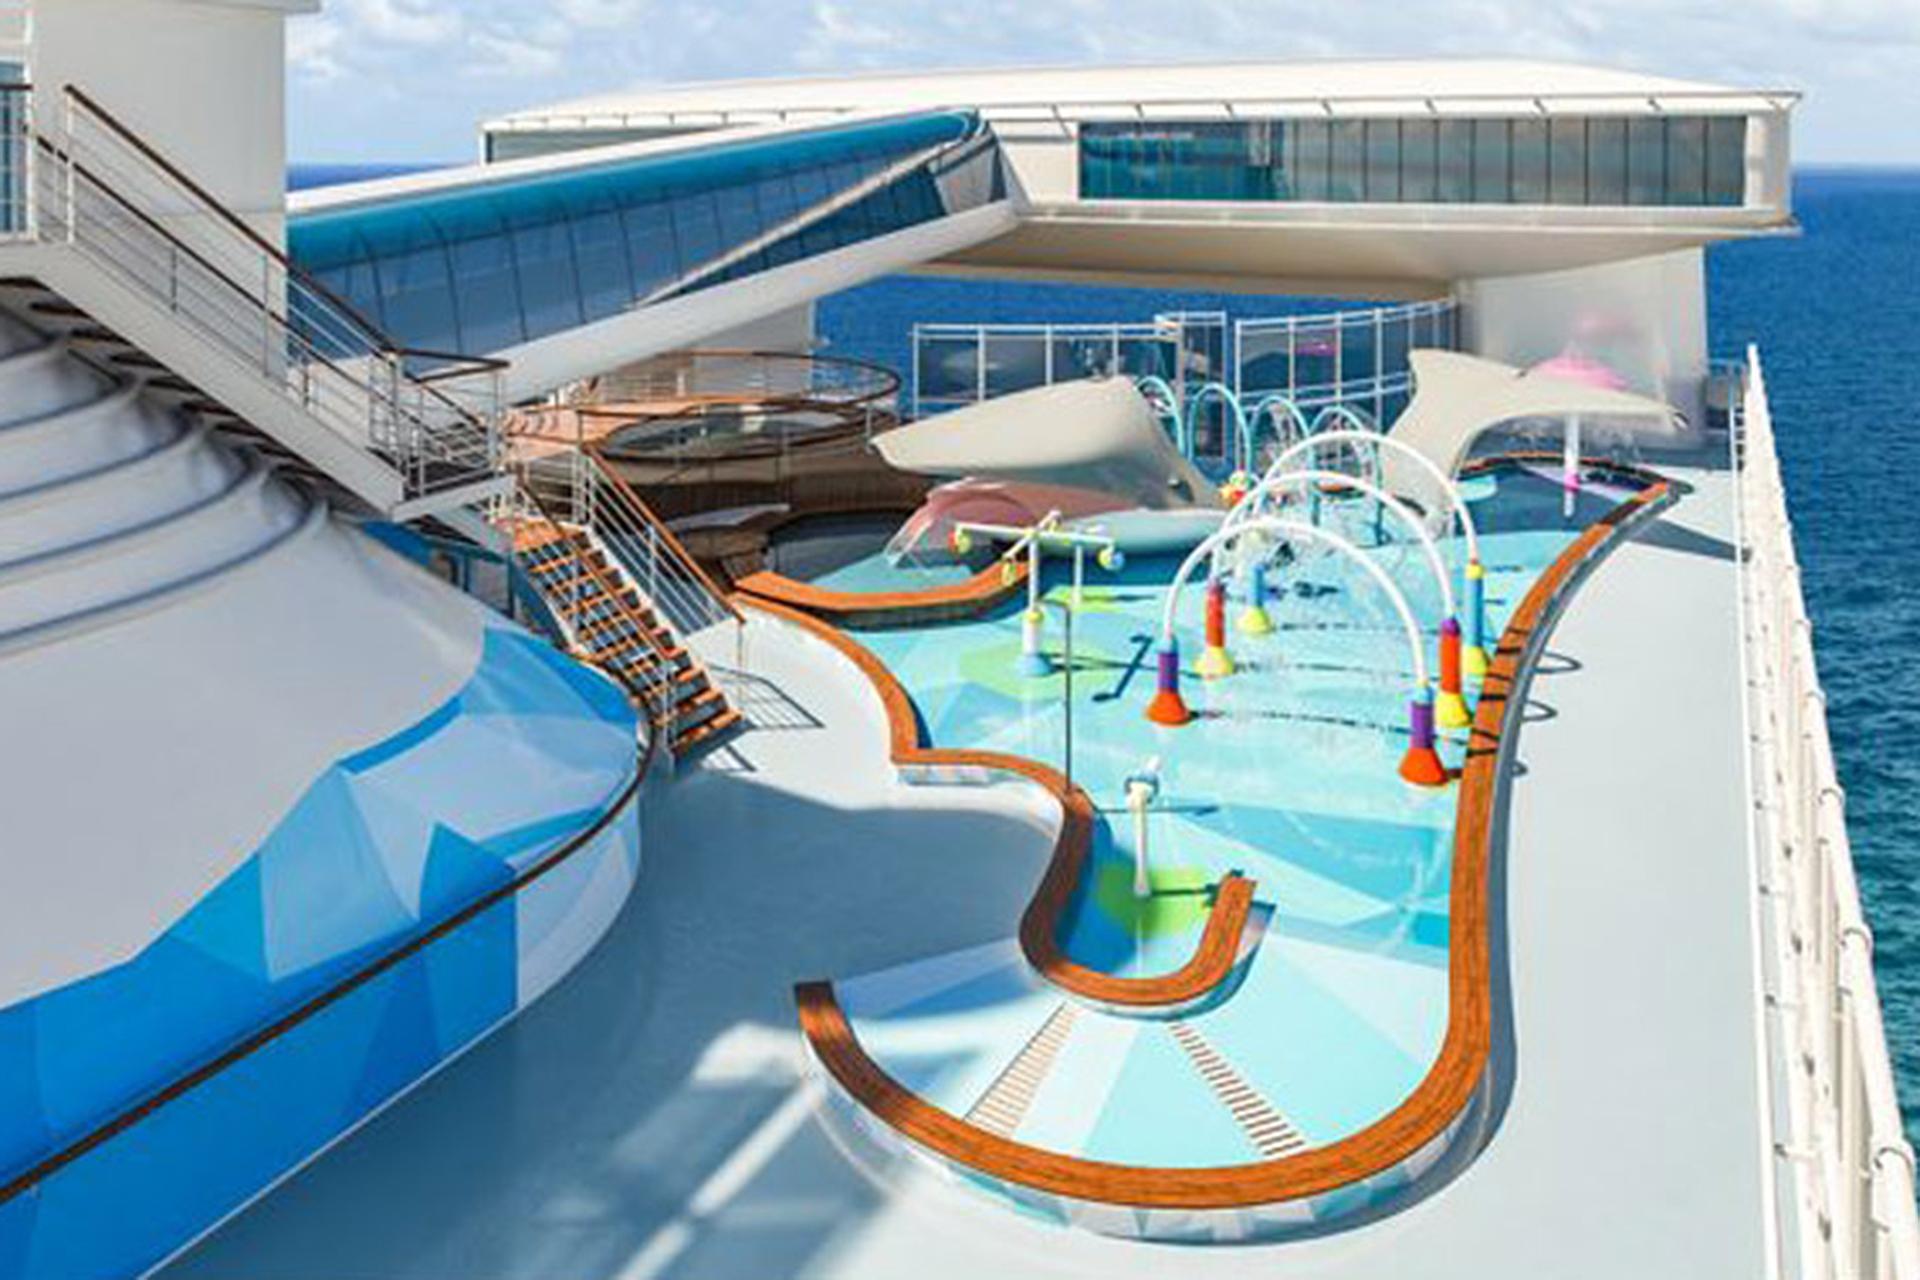 Rendering of Reef Family Splash Zone on Princess Cruises' Caribbean Princess; Courtesy of Princess Cruises